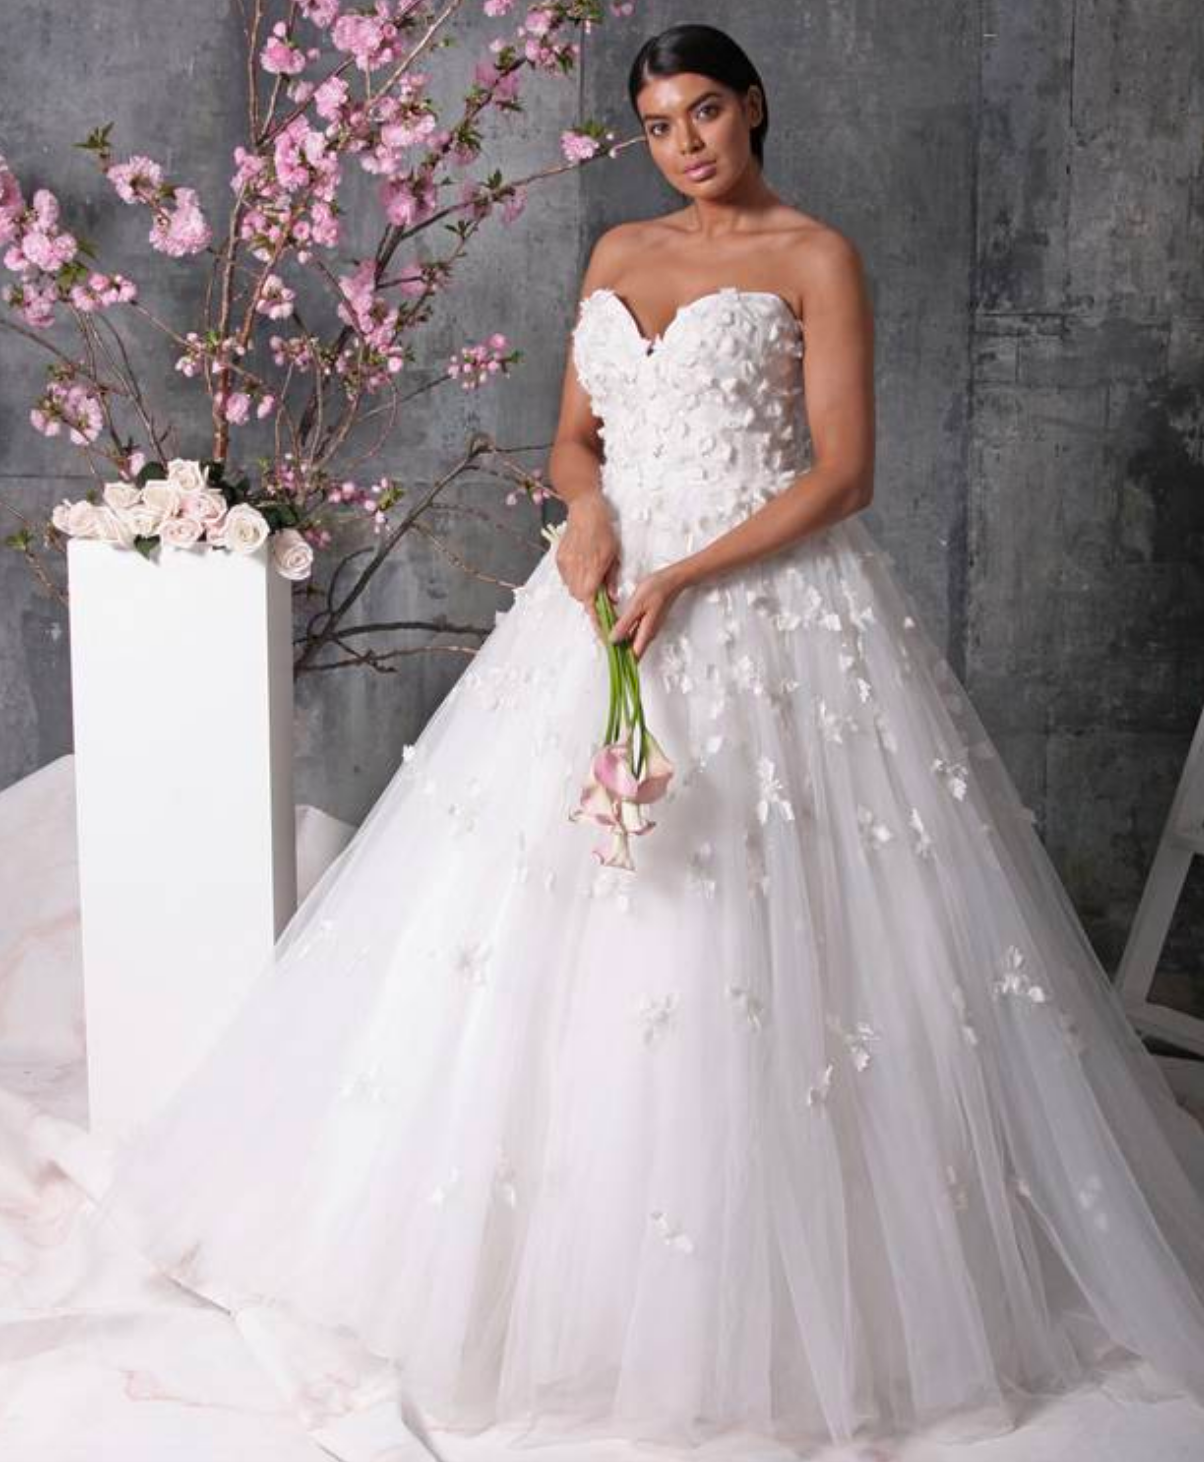 Mariage Christian Siriano Devoile Sa Gamme De Robes De Mariees Grandes Tailles